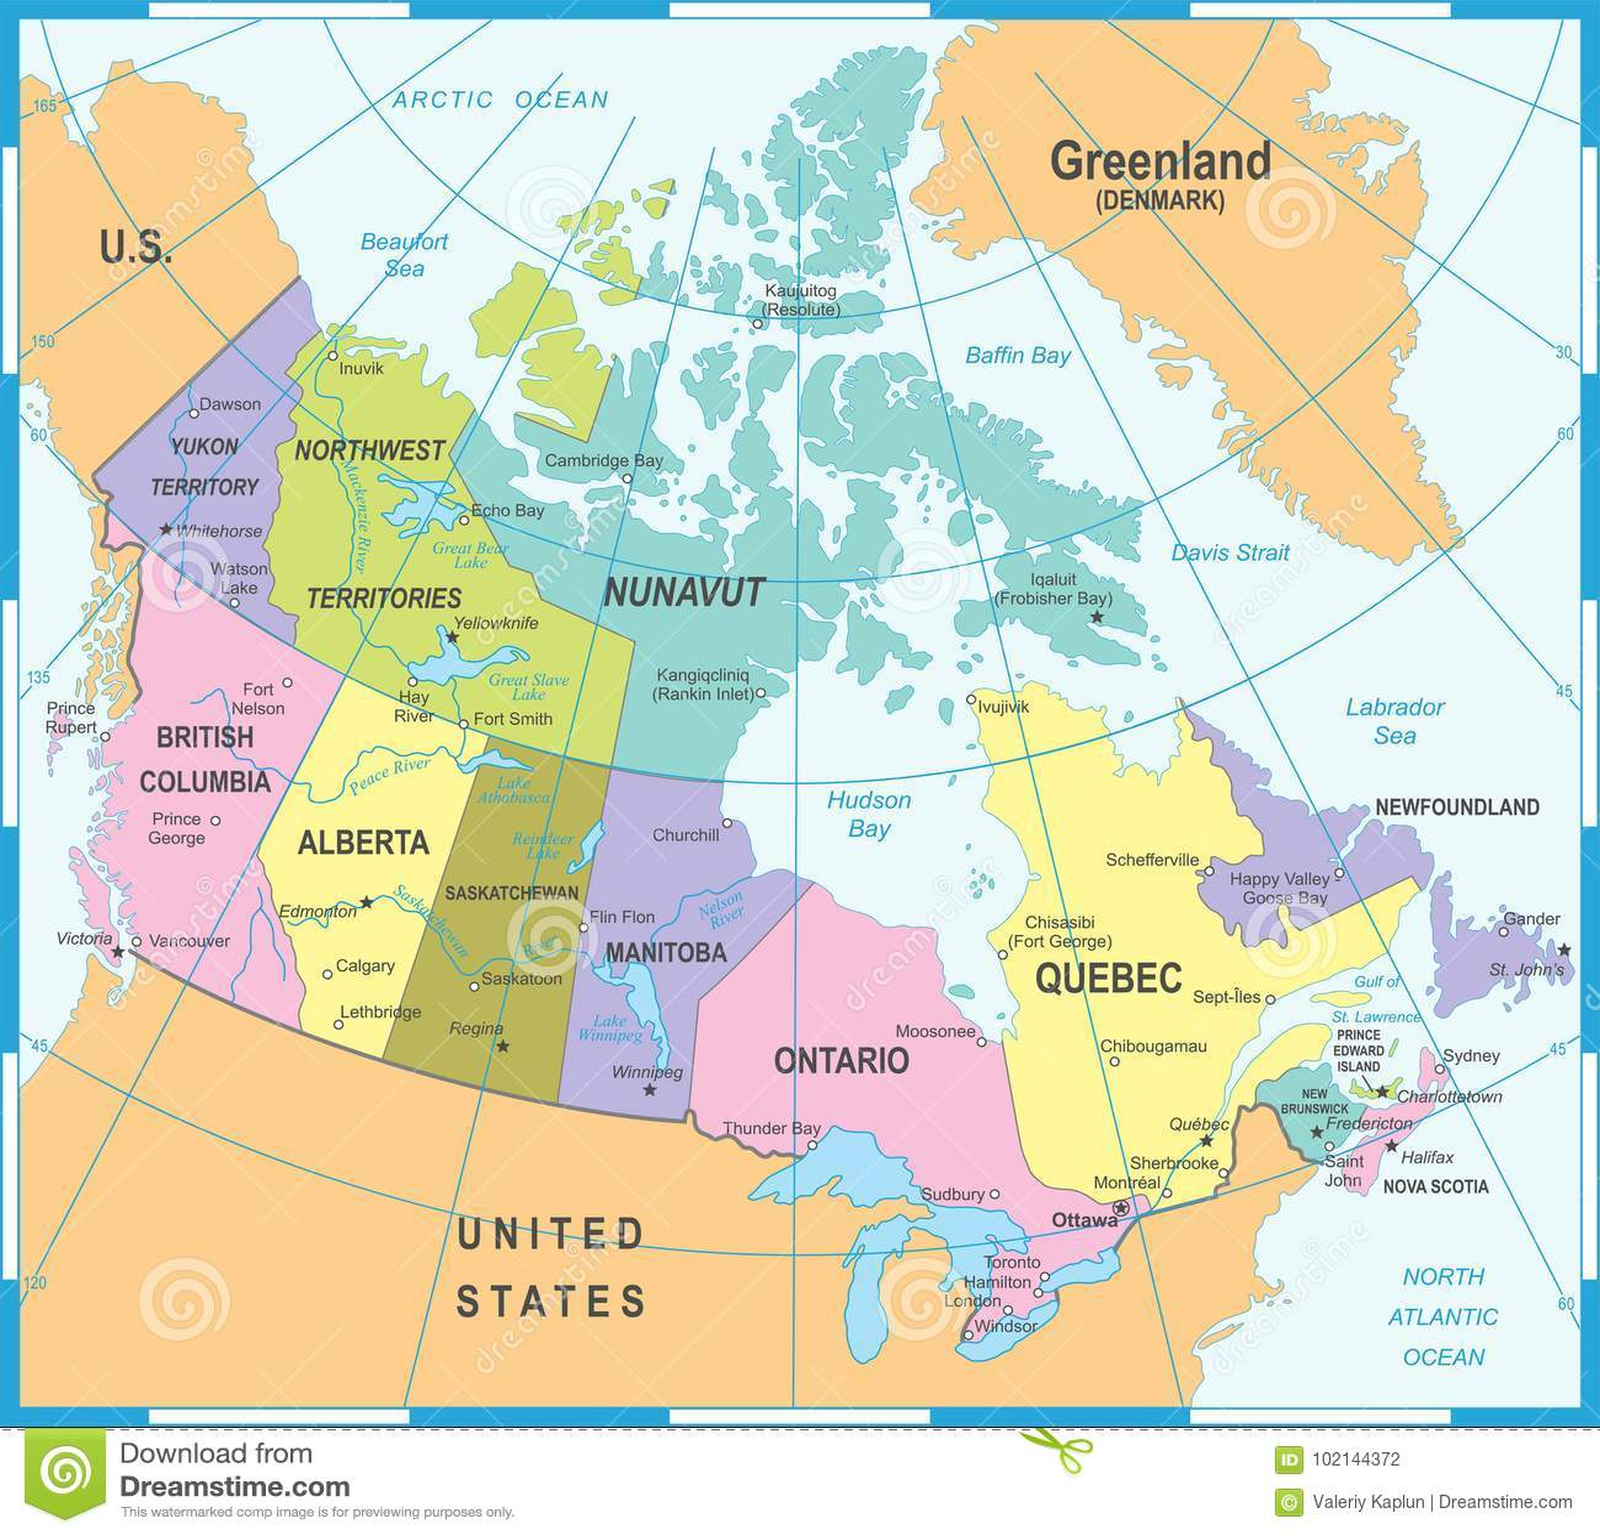 Edmonton On Map Of Canada.Canada Map Vector Illustration Stock Illustration Illustration